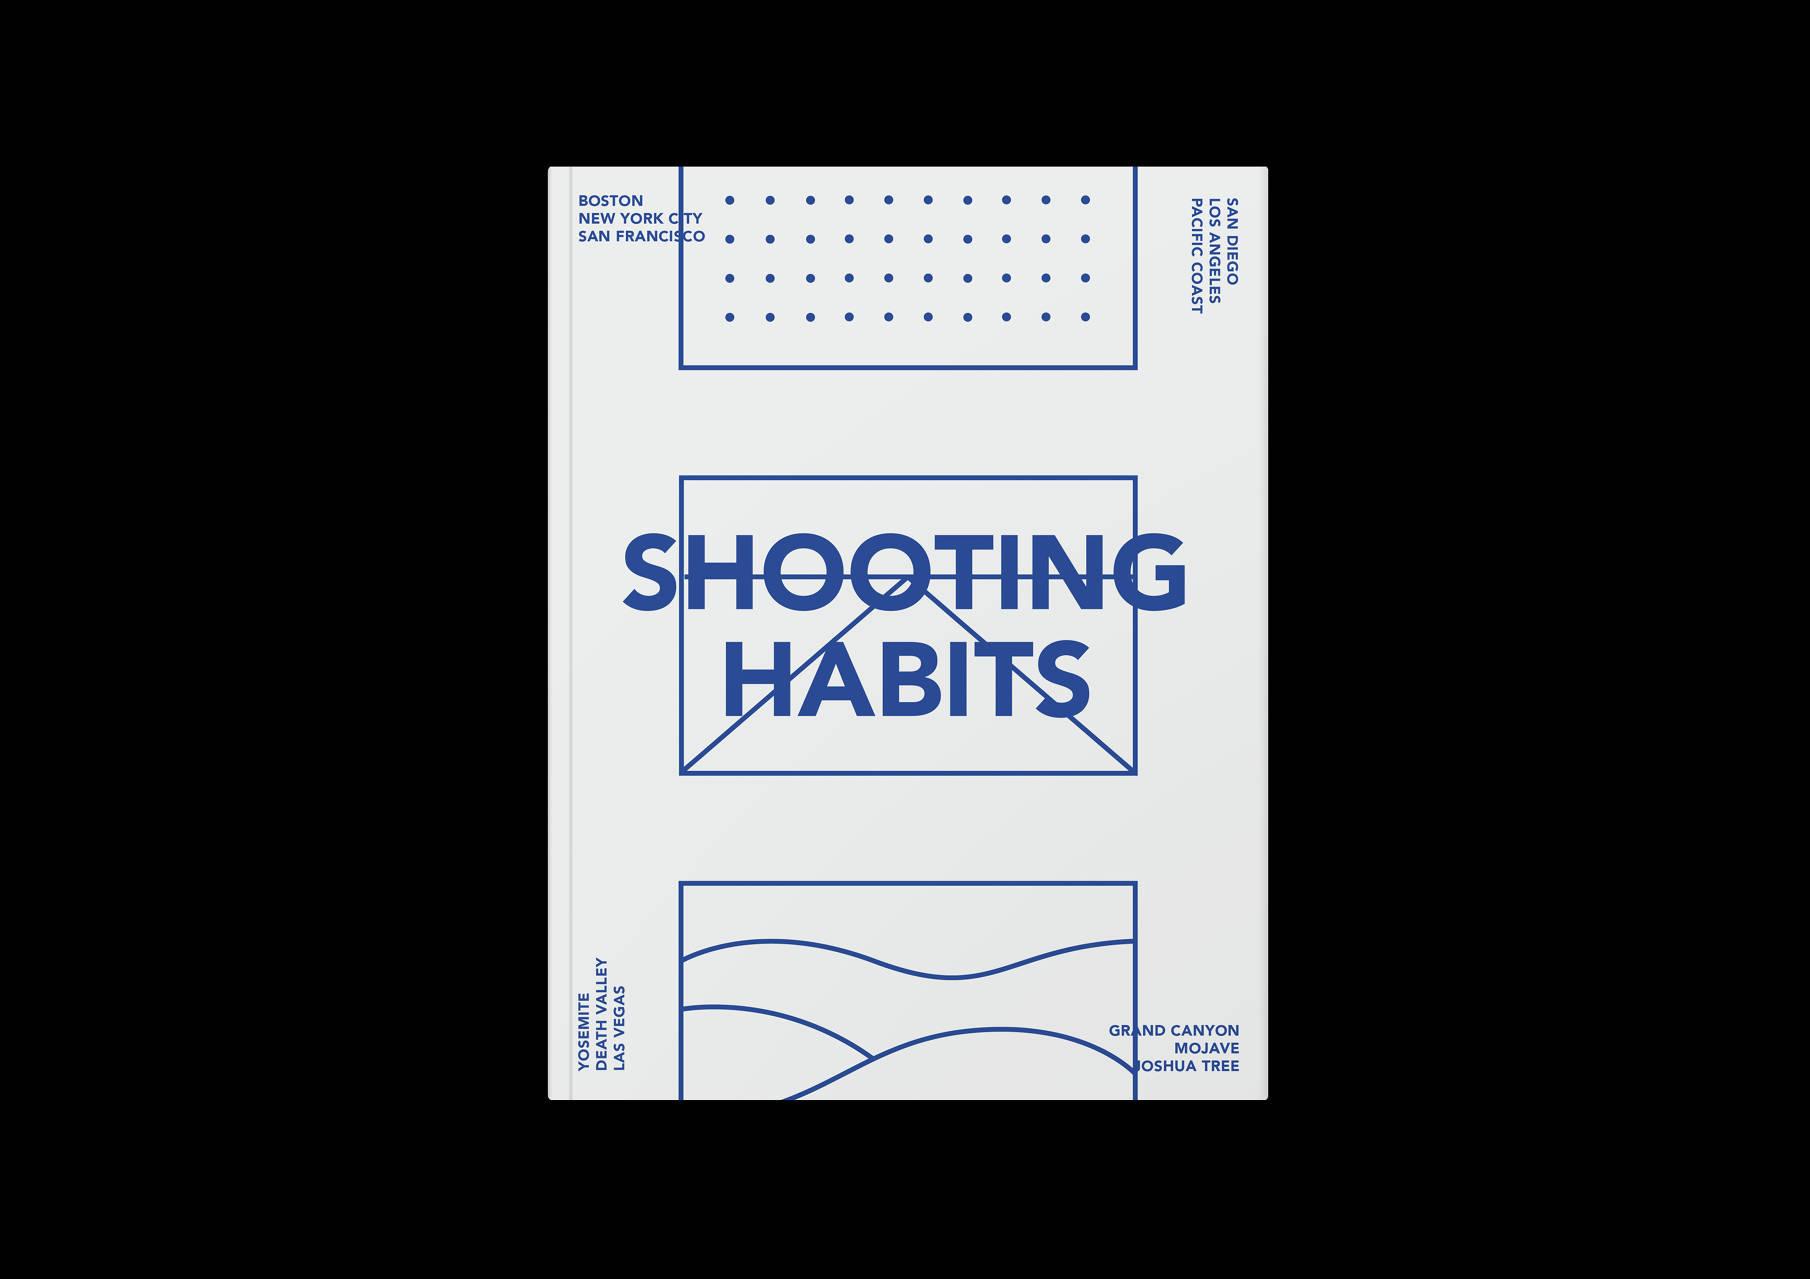 SHOOTING HABITS - Kasper Pyndt